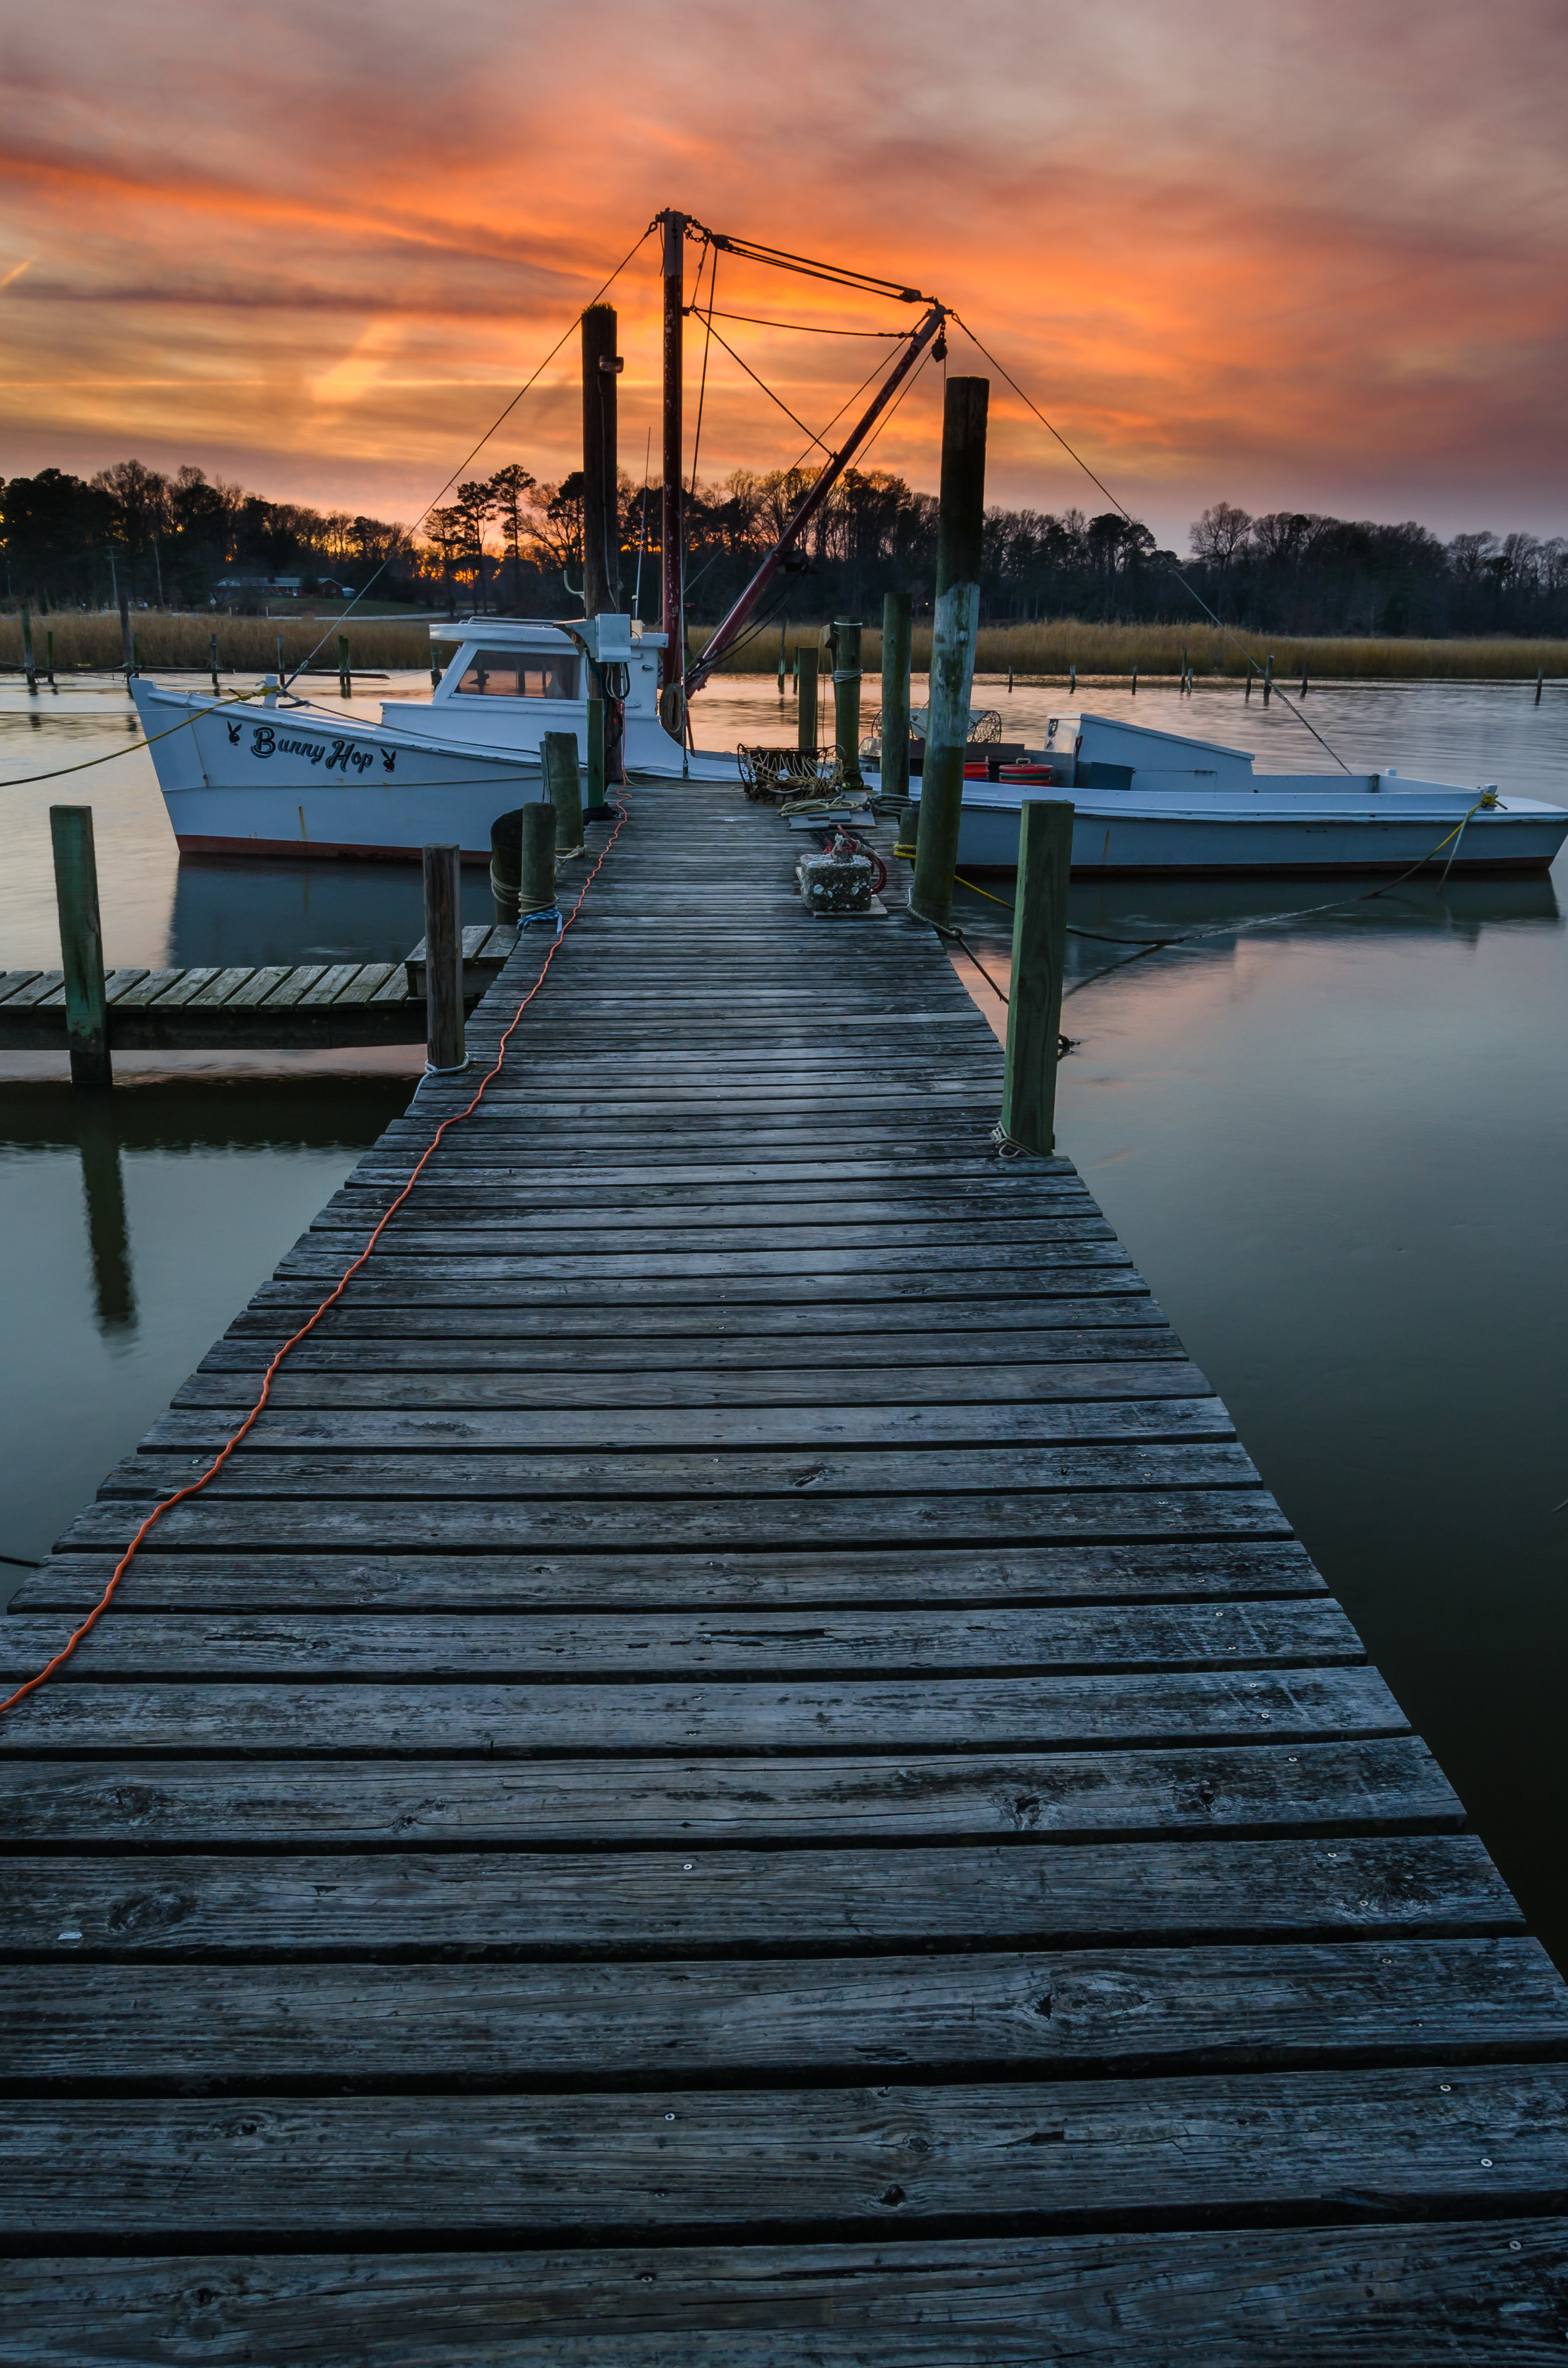 boat-rescue-jones creek-pier-isle of wight county-virginia-sunset.jpg